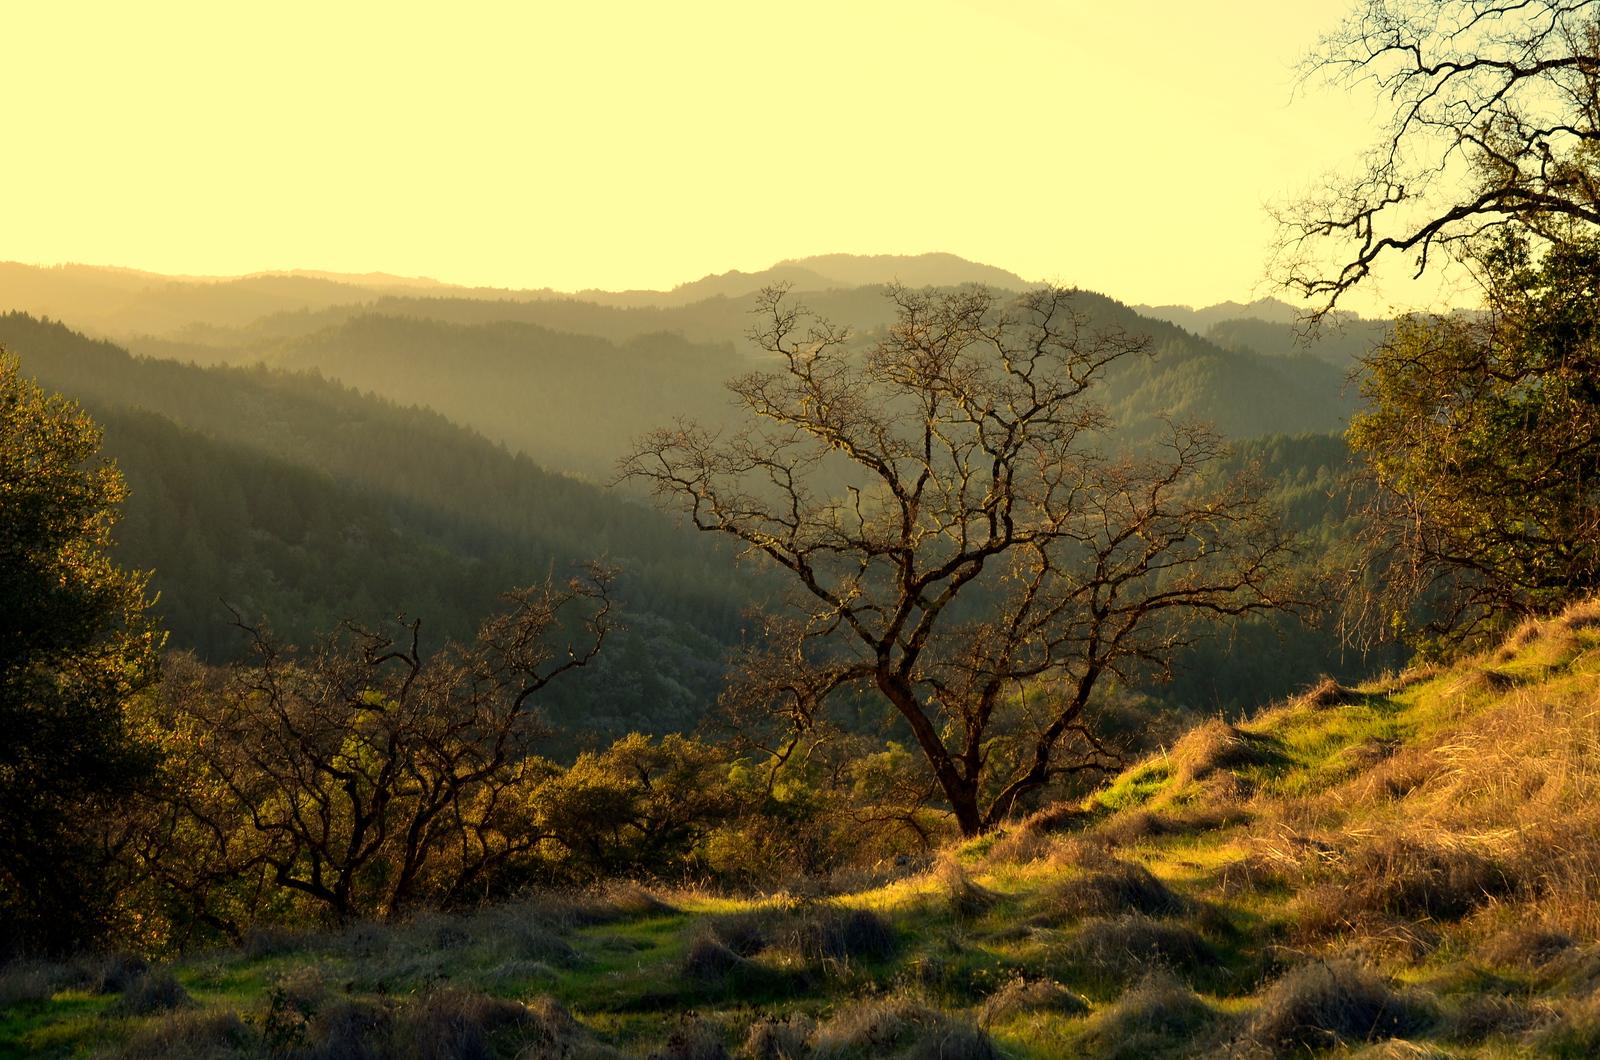 Dusk on Gilliam Trail